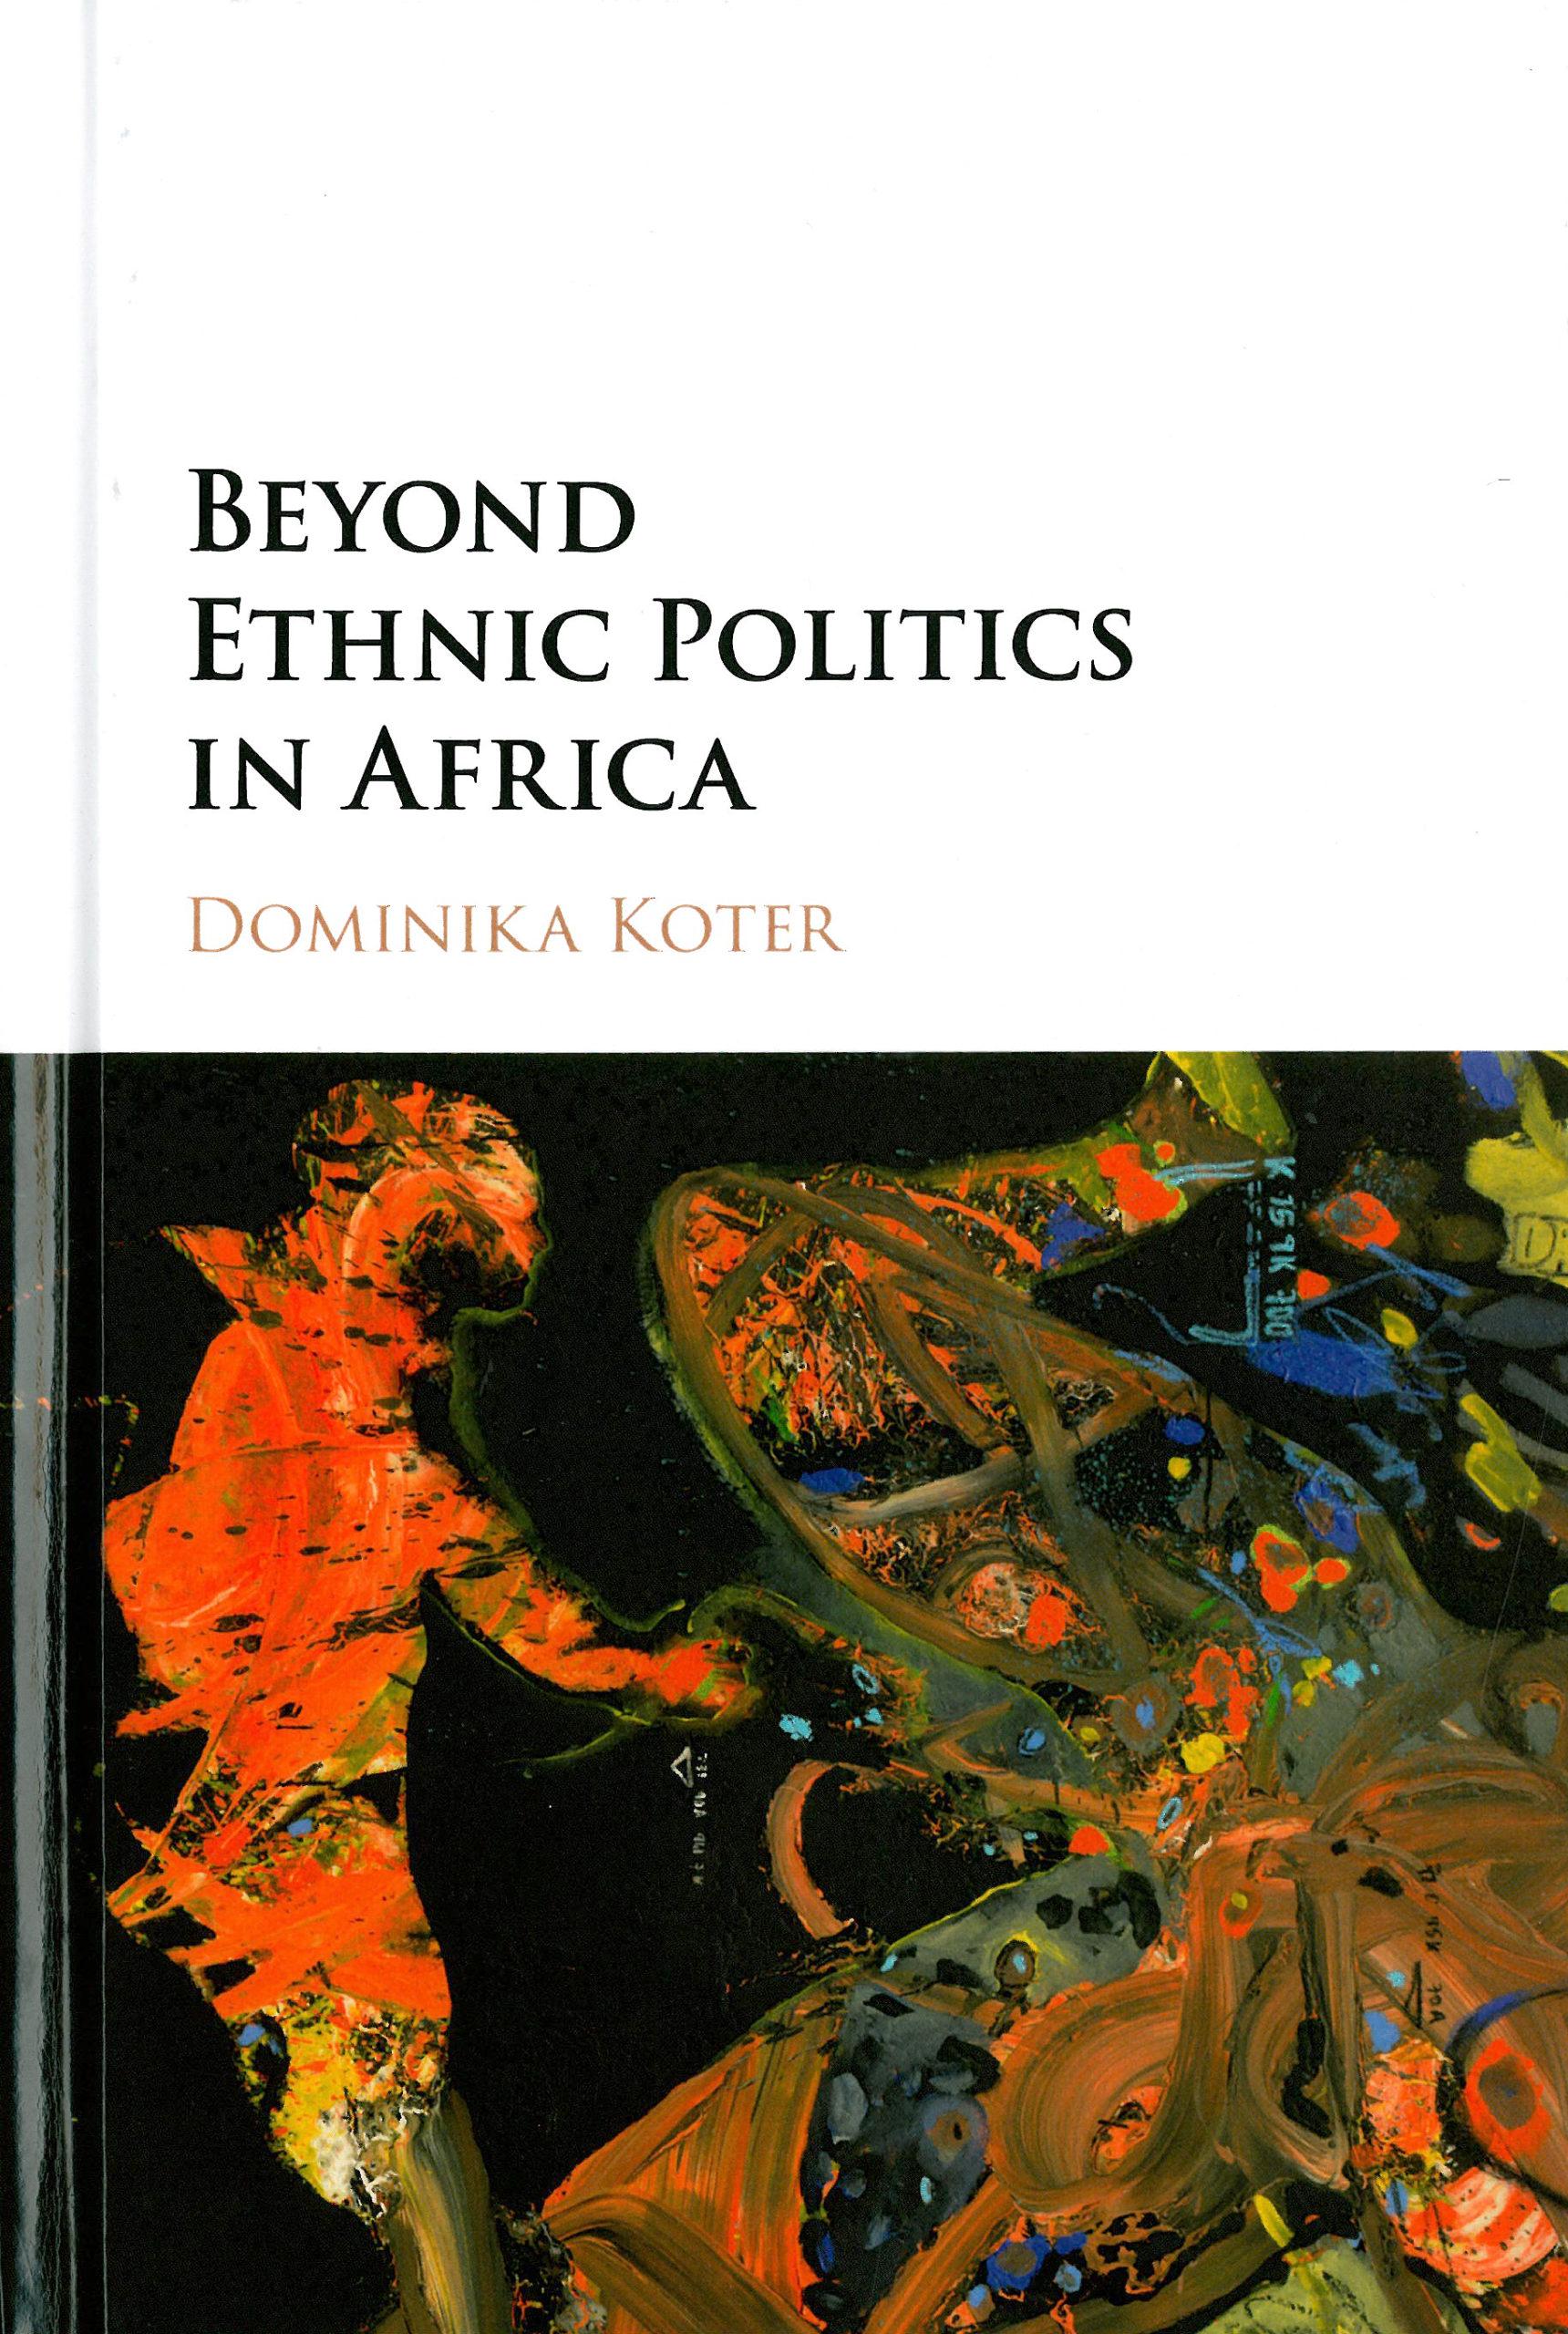 Dominika Koter: Beyond Ethnic Politics in Africa. Cambridge University Press 2016, 202 s.